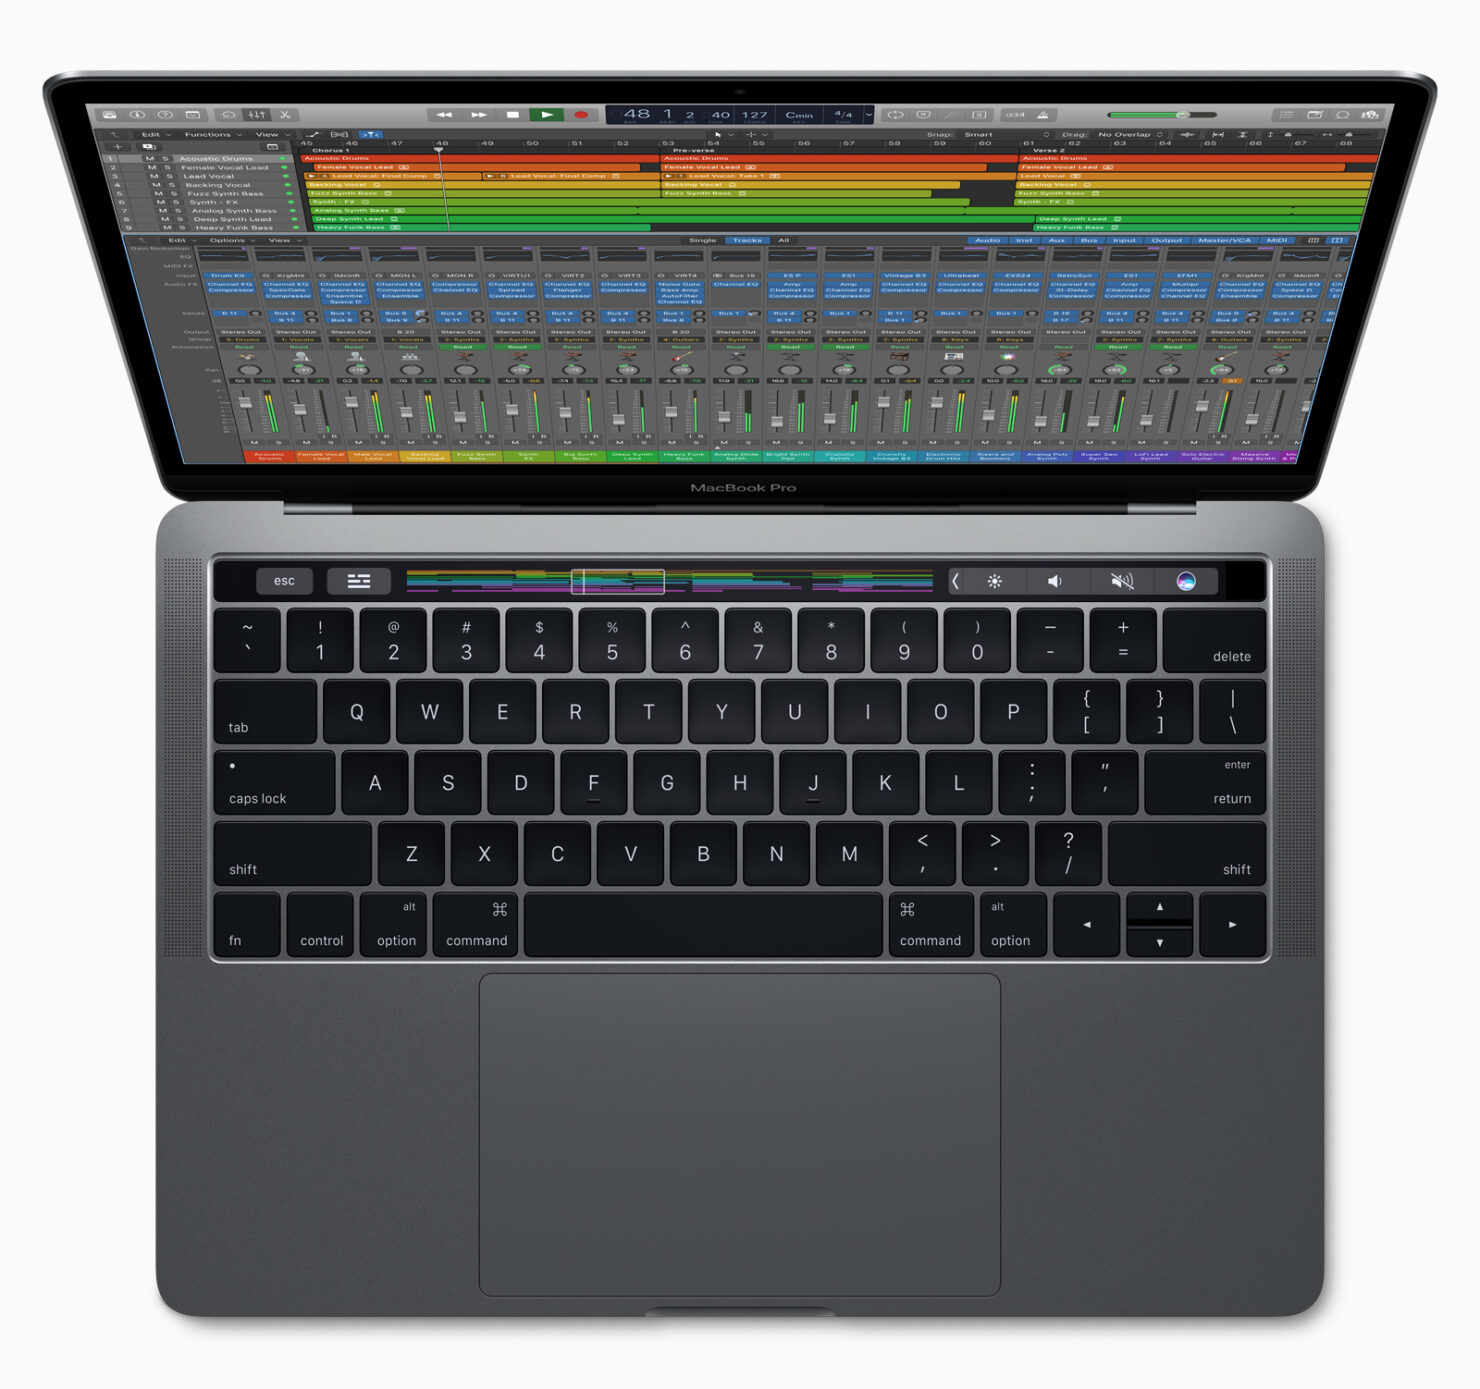 logic-pro-macbookpro-touchbar-top-view